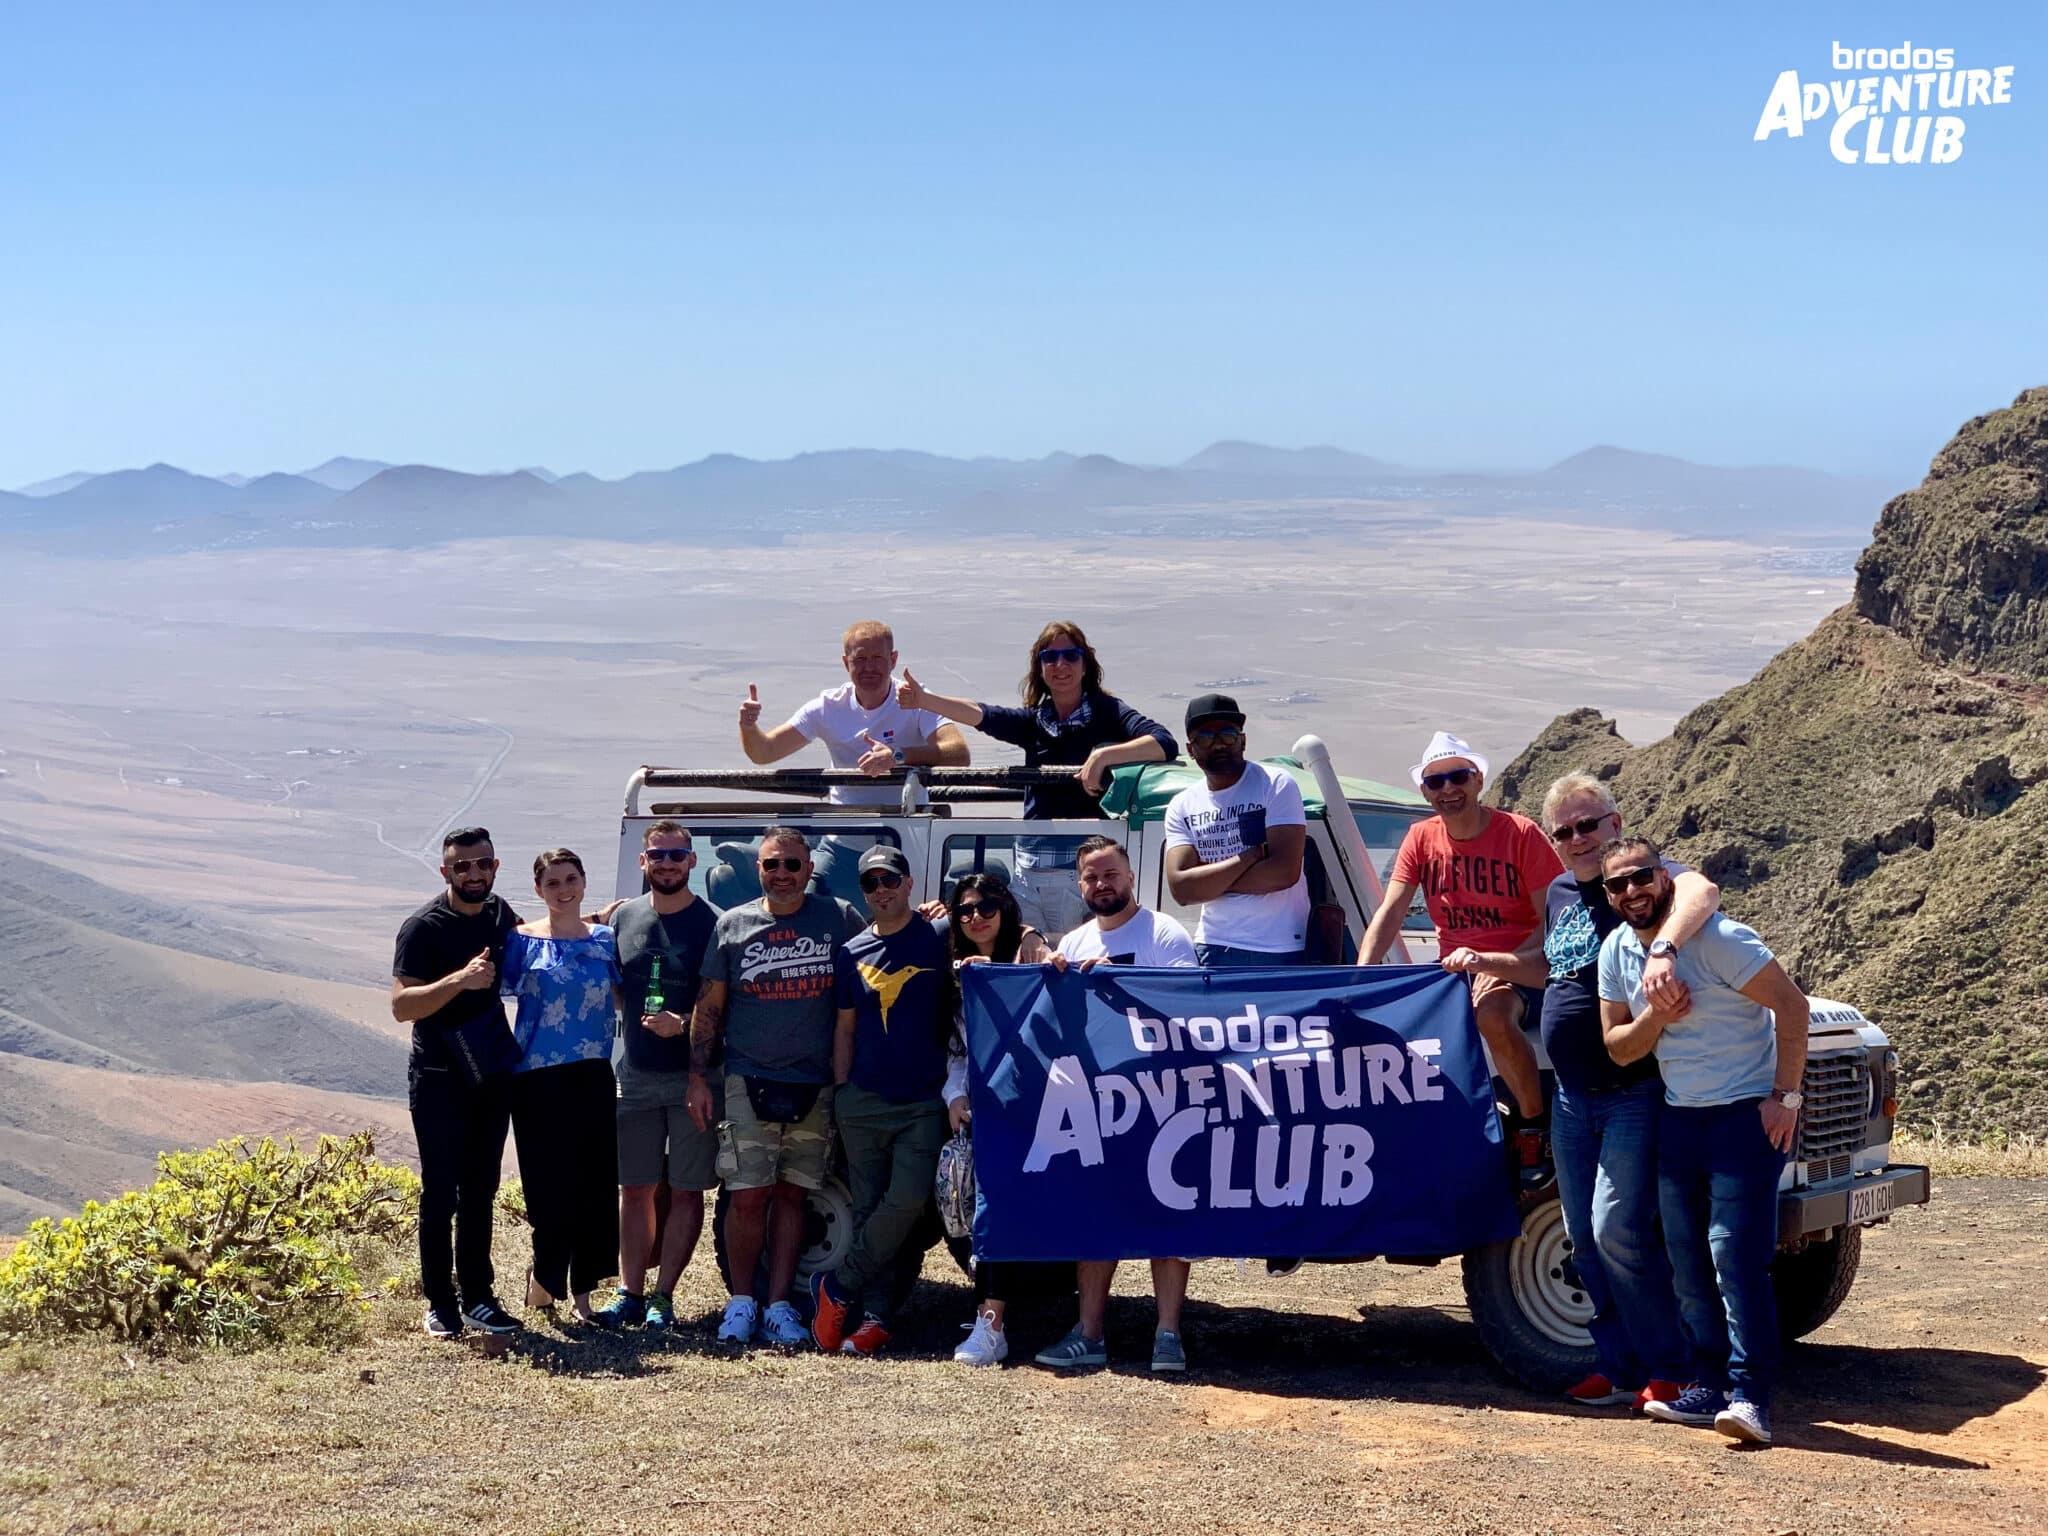 Brodos Adventure Club Member. Fuerteventura 2019